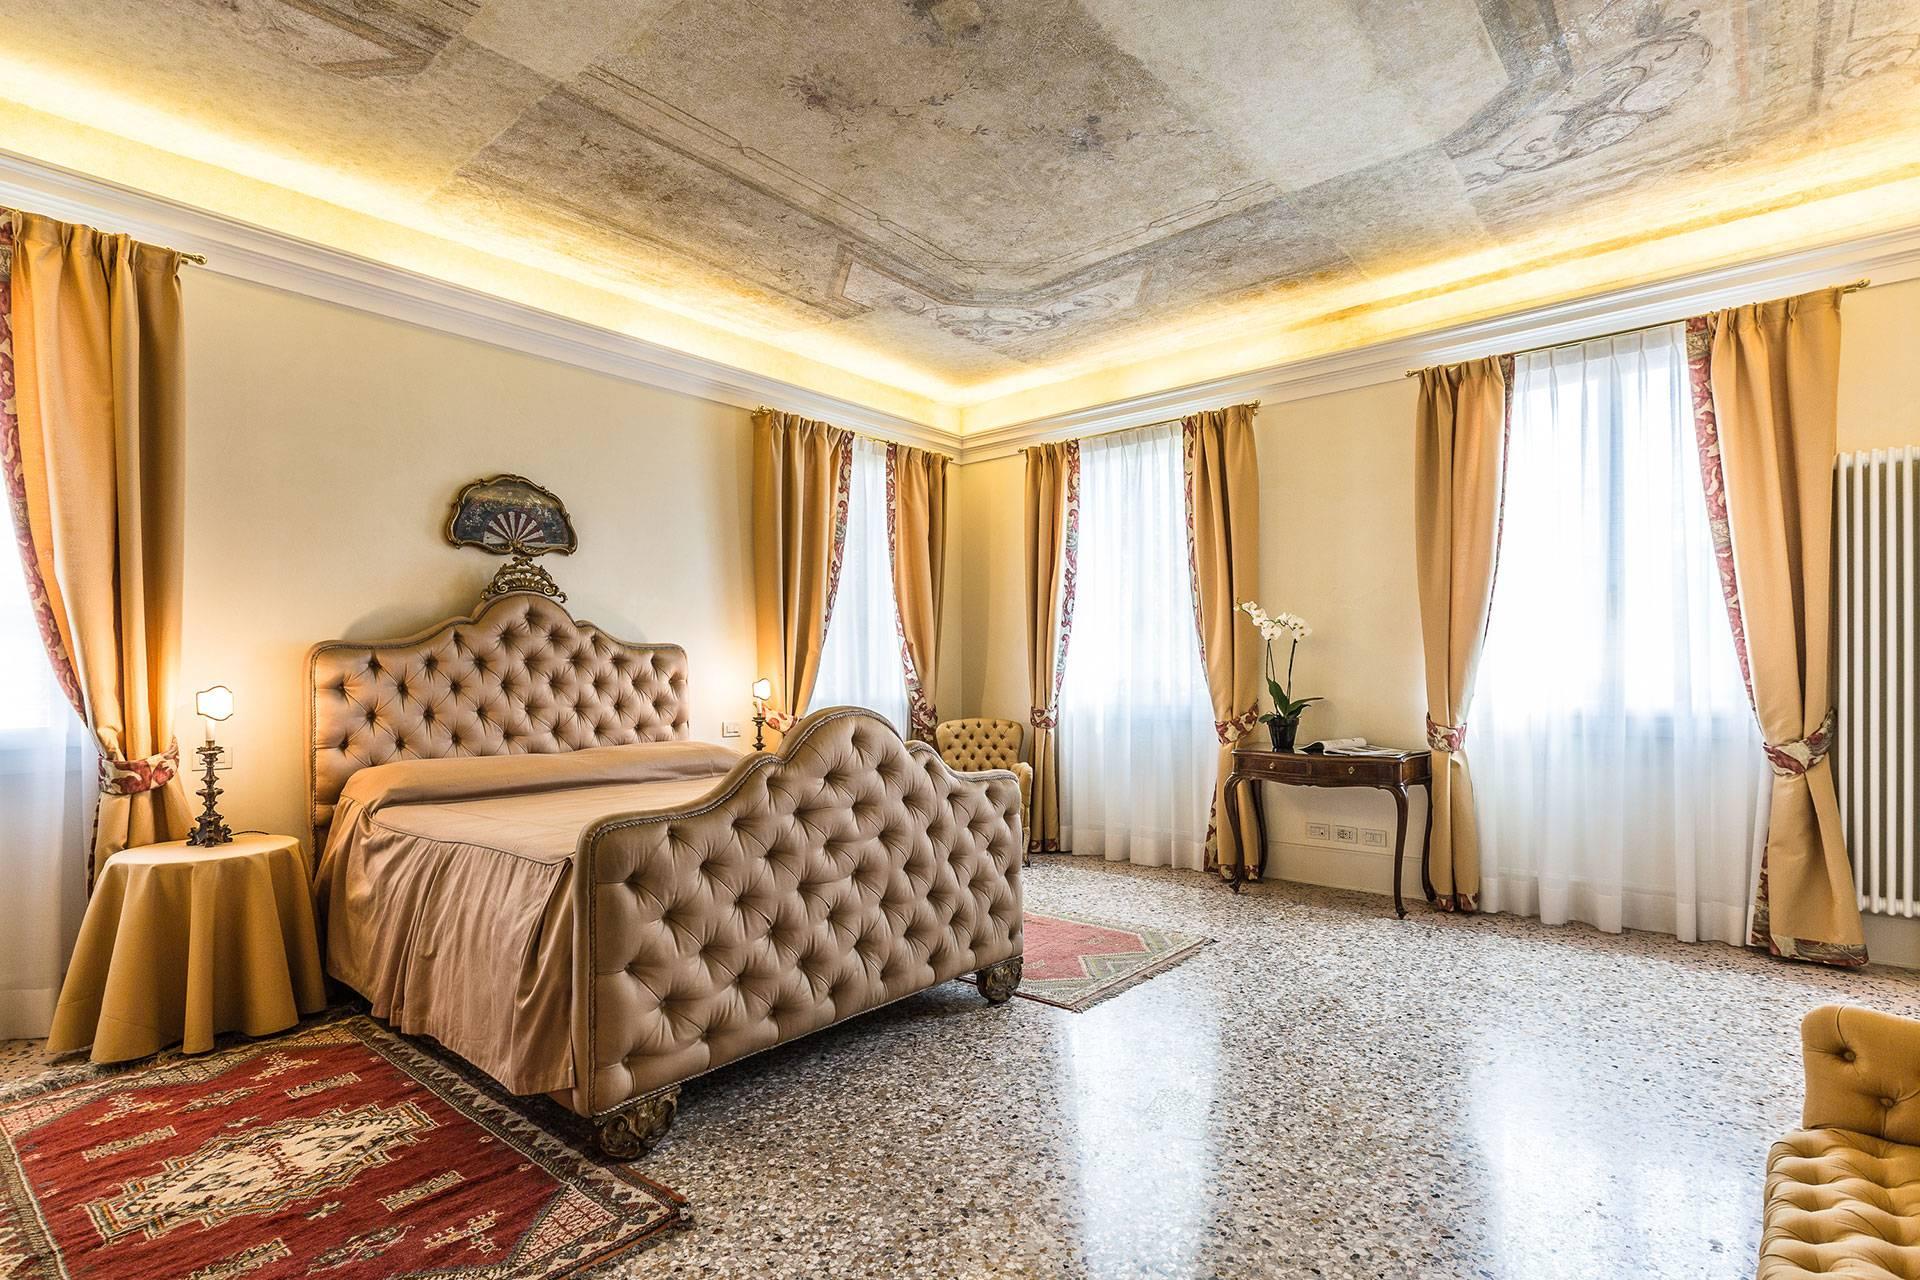 features precious frescoes and textiles